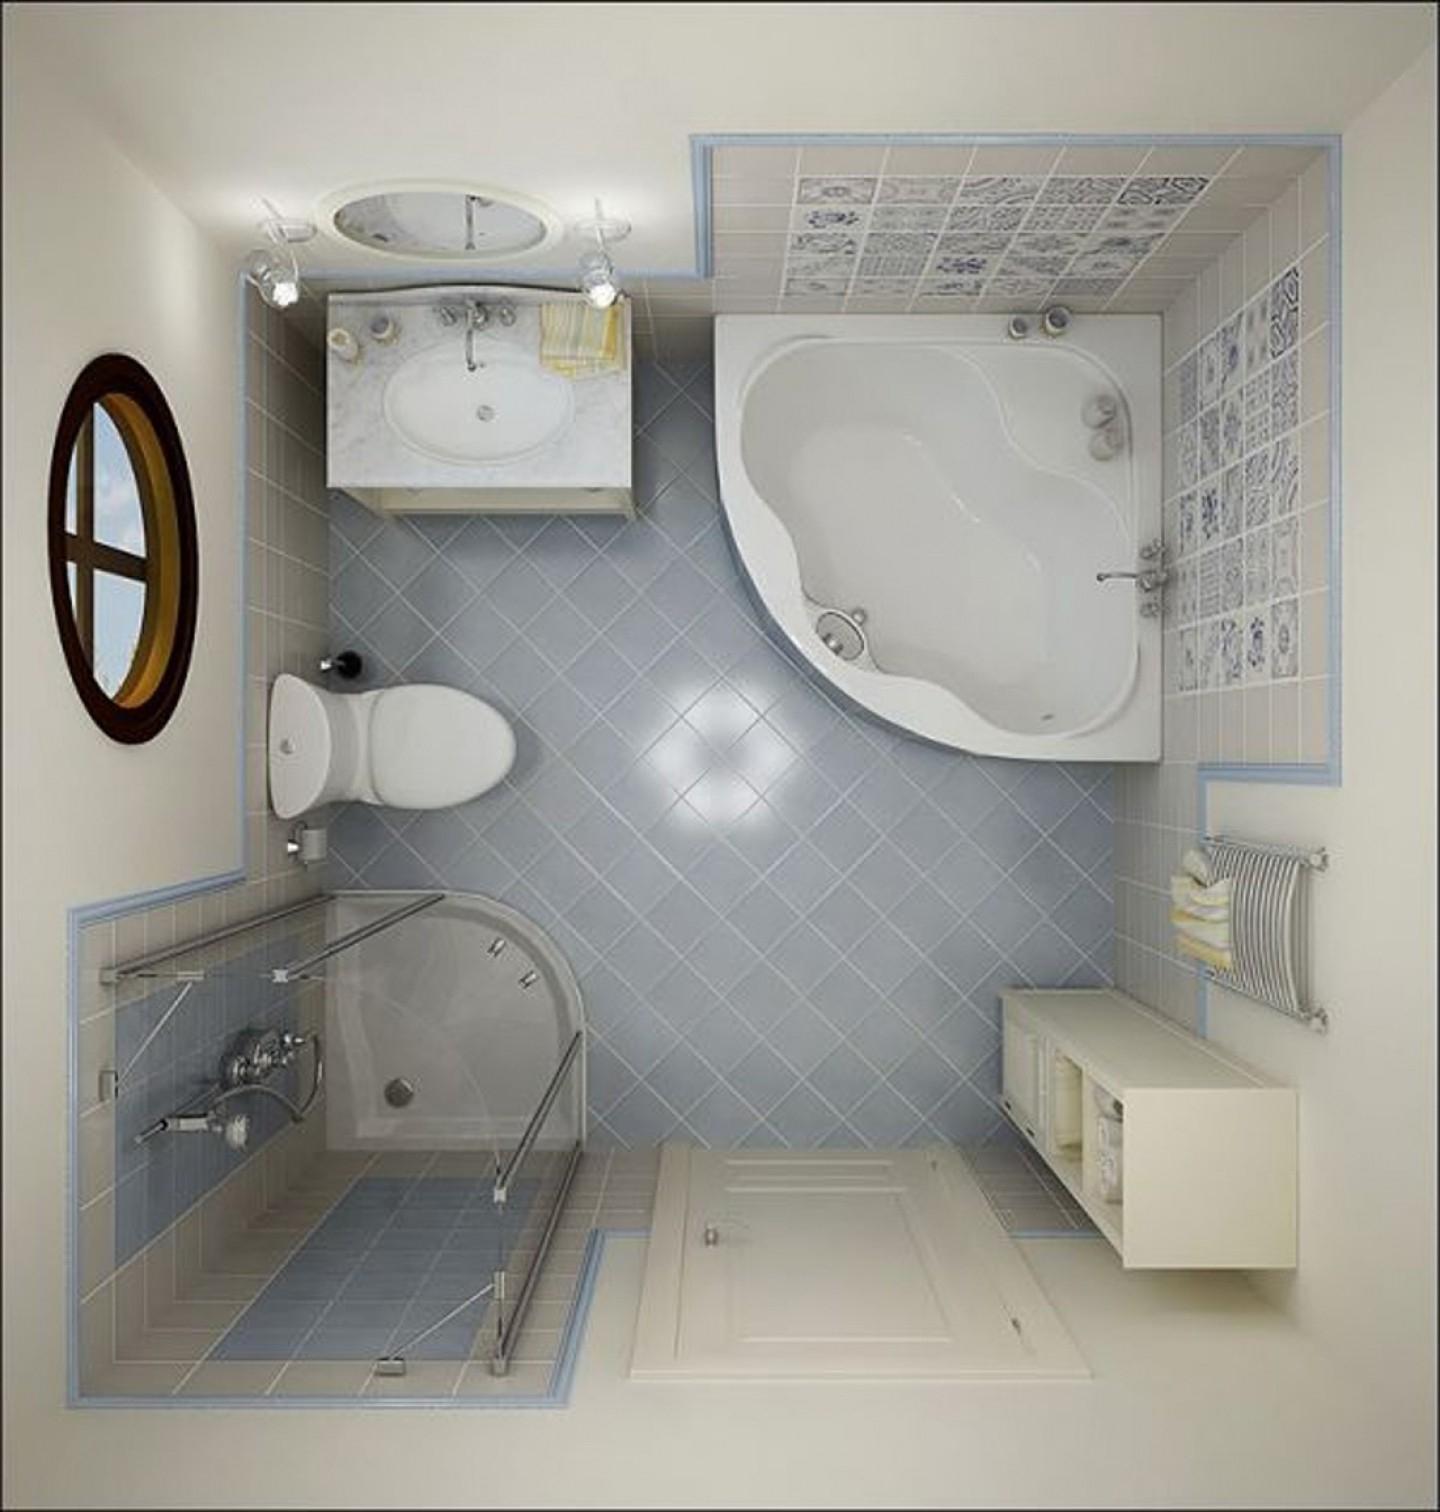 Corner Bathtub Shower How To Choose The Best Ideas On Foter